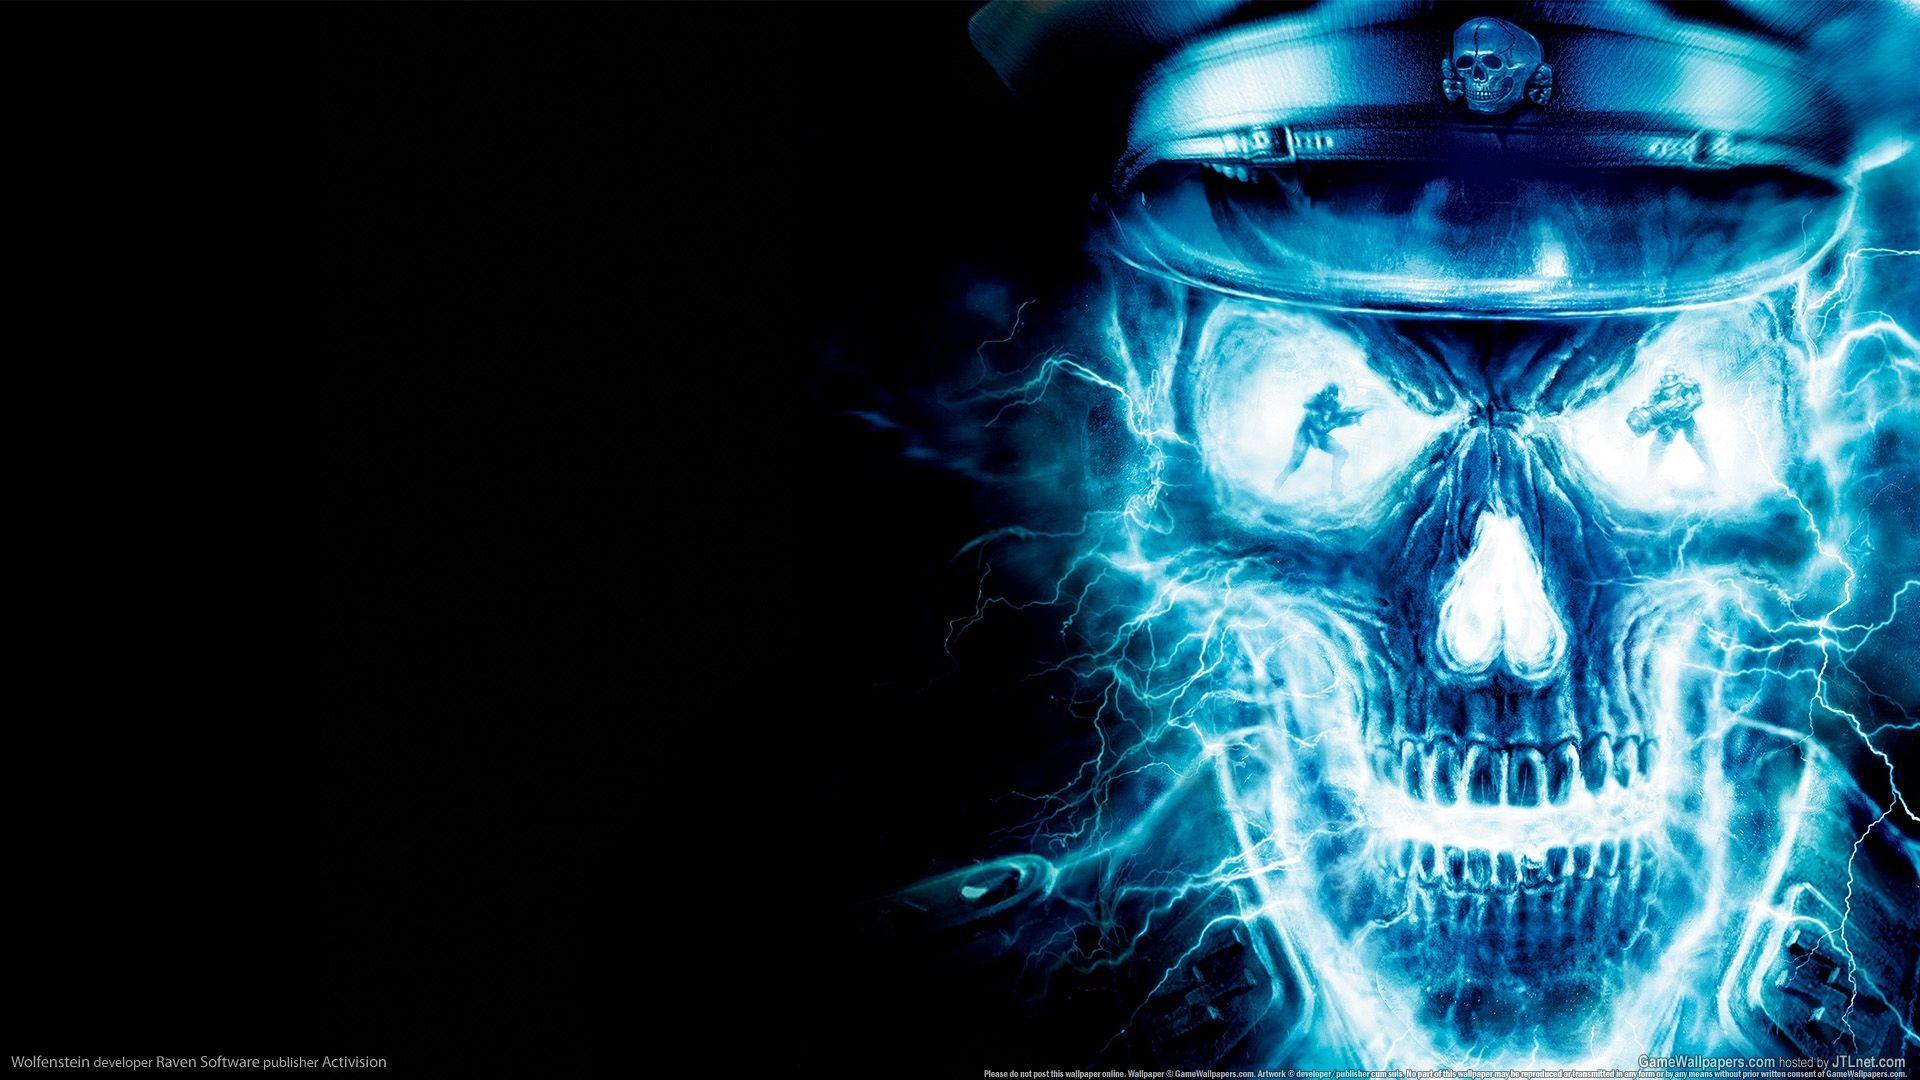 Download Wallpaper Horse Lightning - ceba6887186bd4ab1d5322786869dc29  Image_84616.jpg